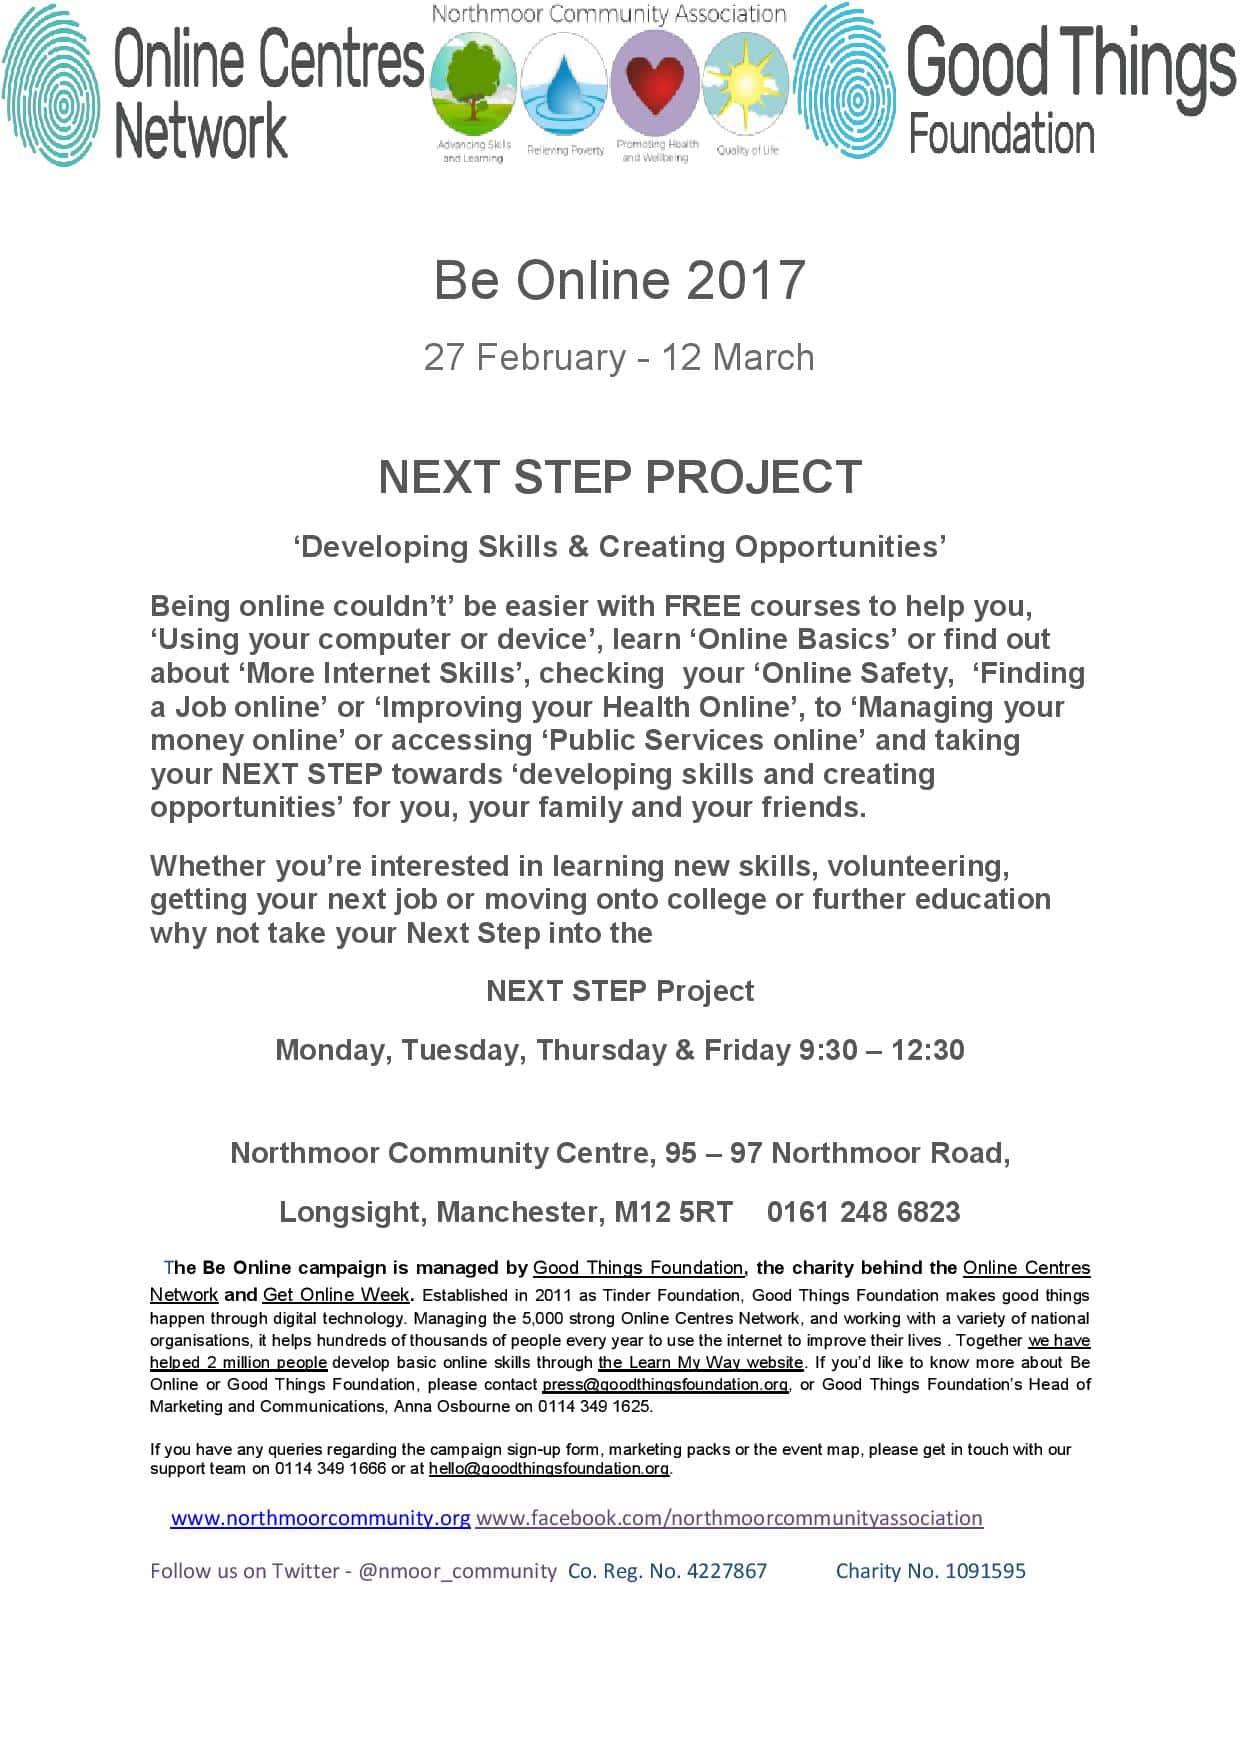 northmoor community association northmoor community association 24th 2017 leave a comment